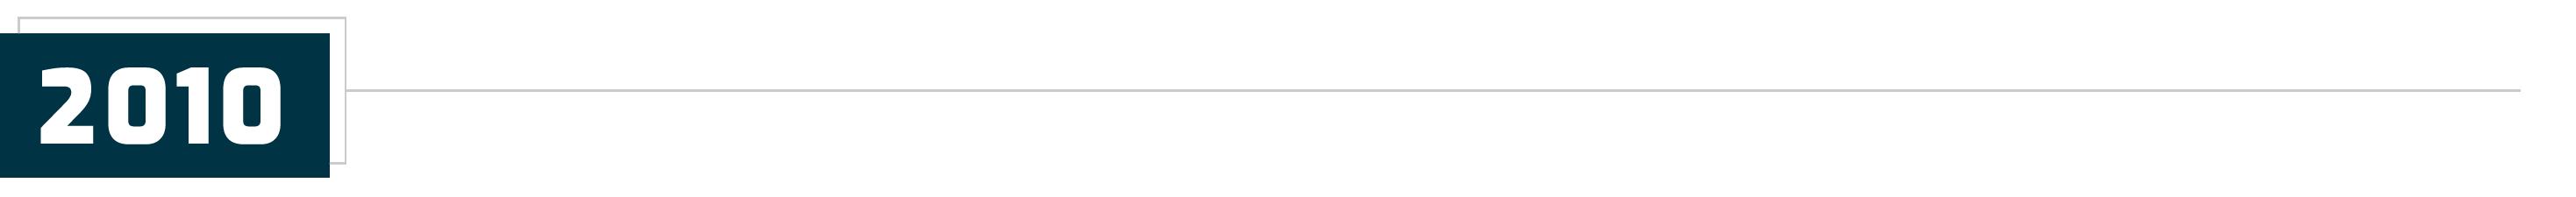 Choice Bank Timeline 2010